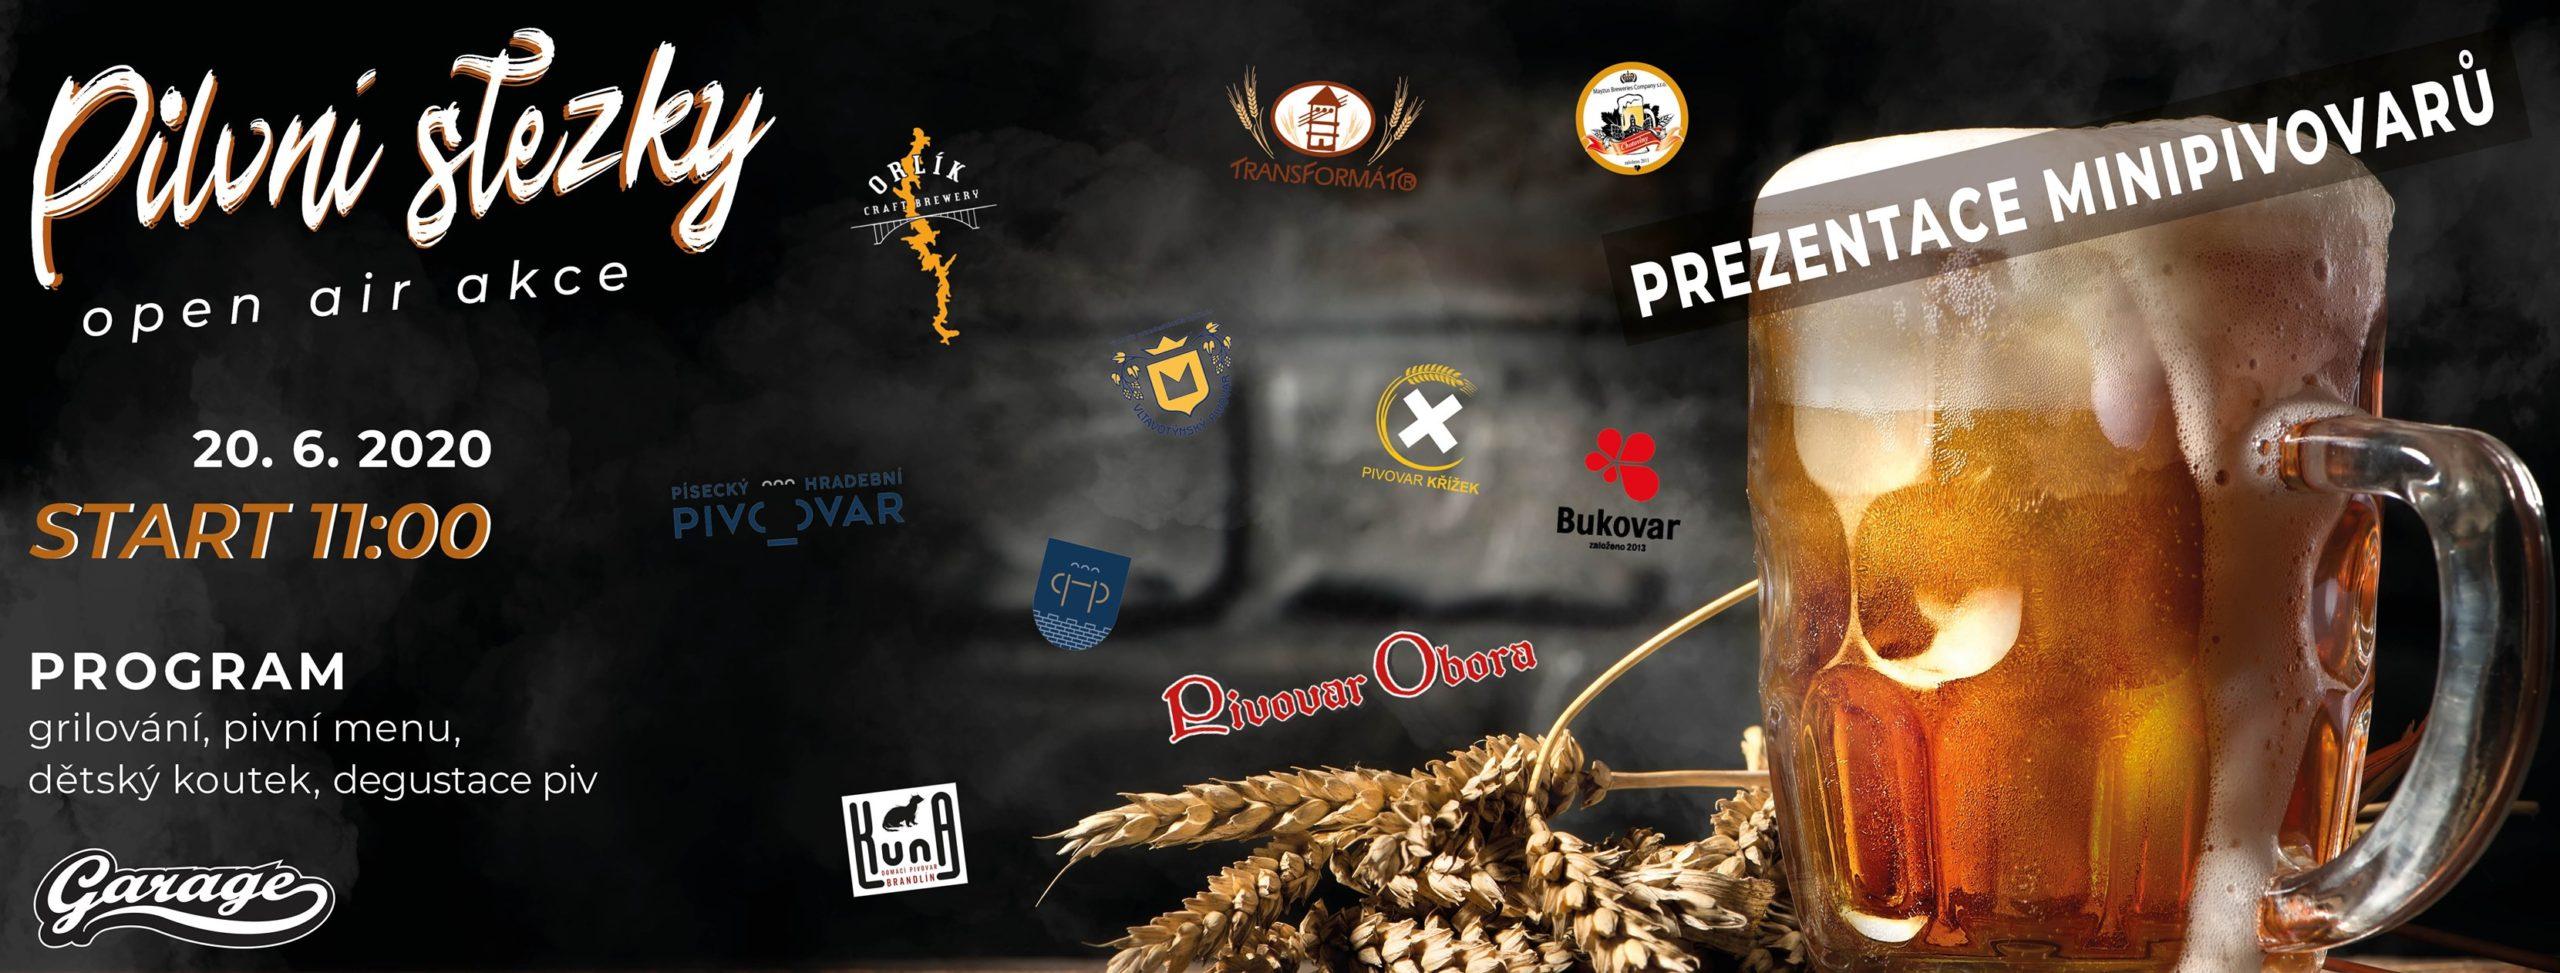 pivovary-pivni-akce-open-air-prezentace-minipivovaru-tabor-2020